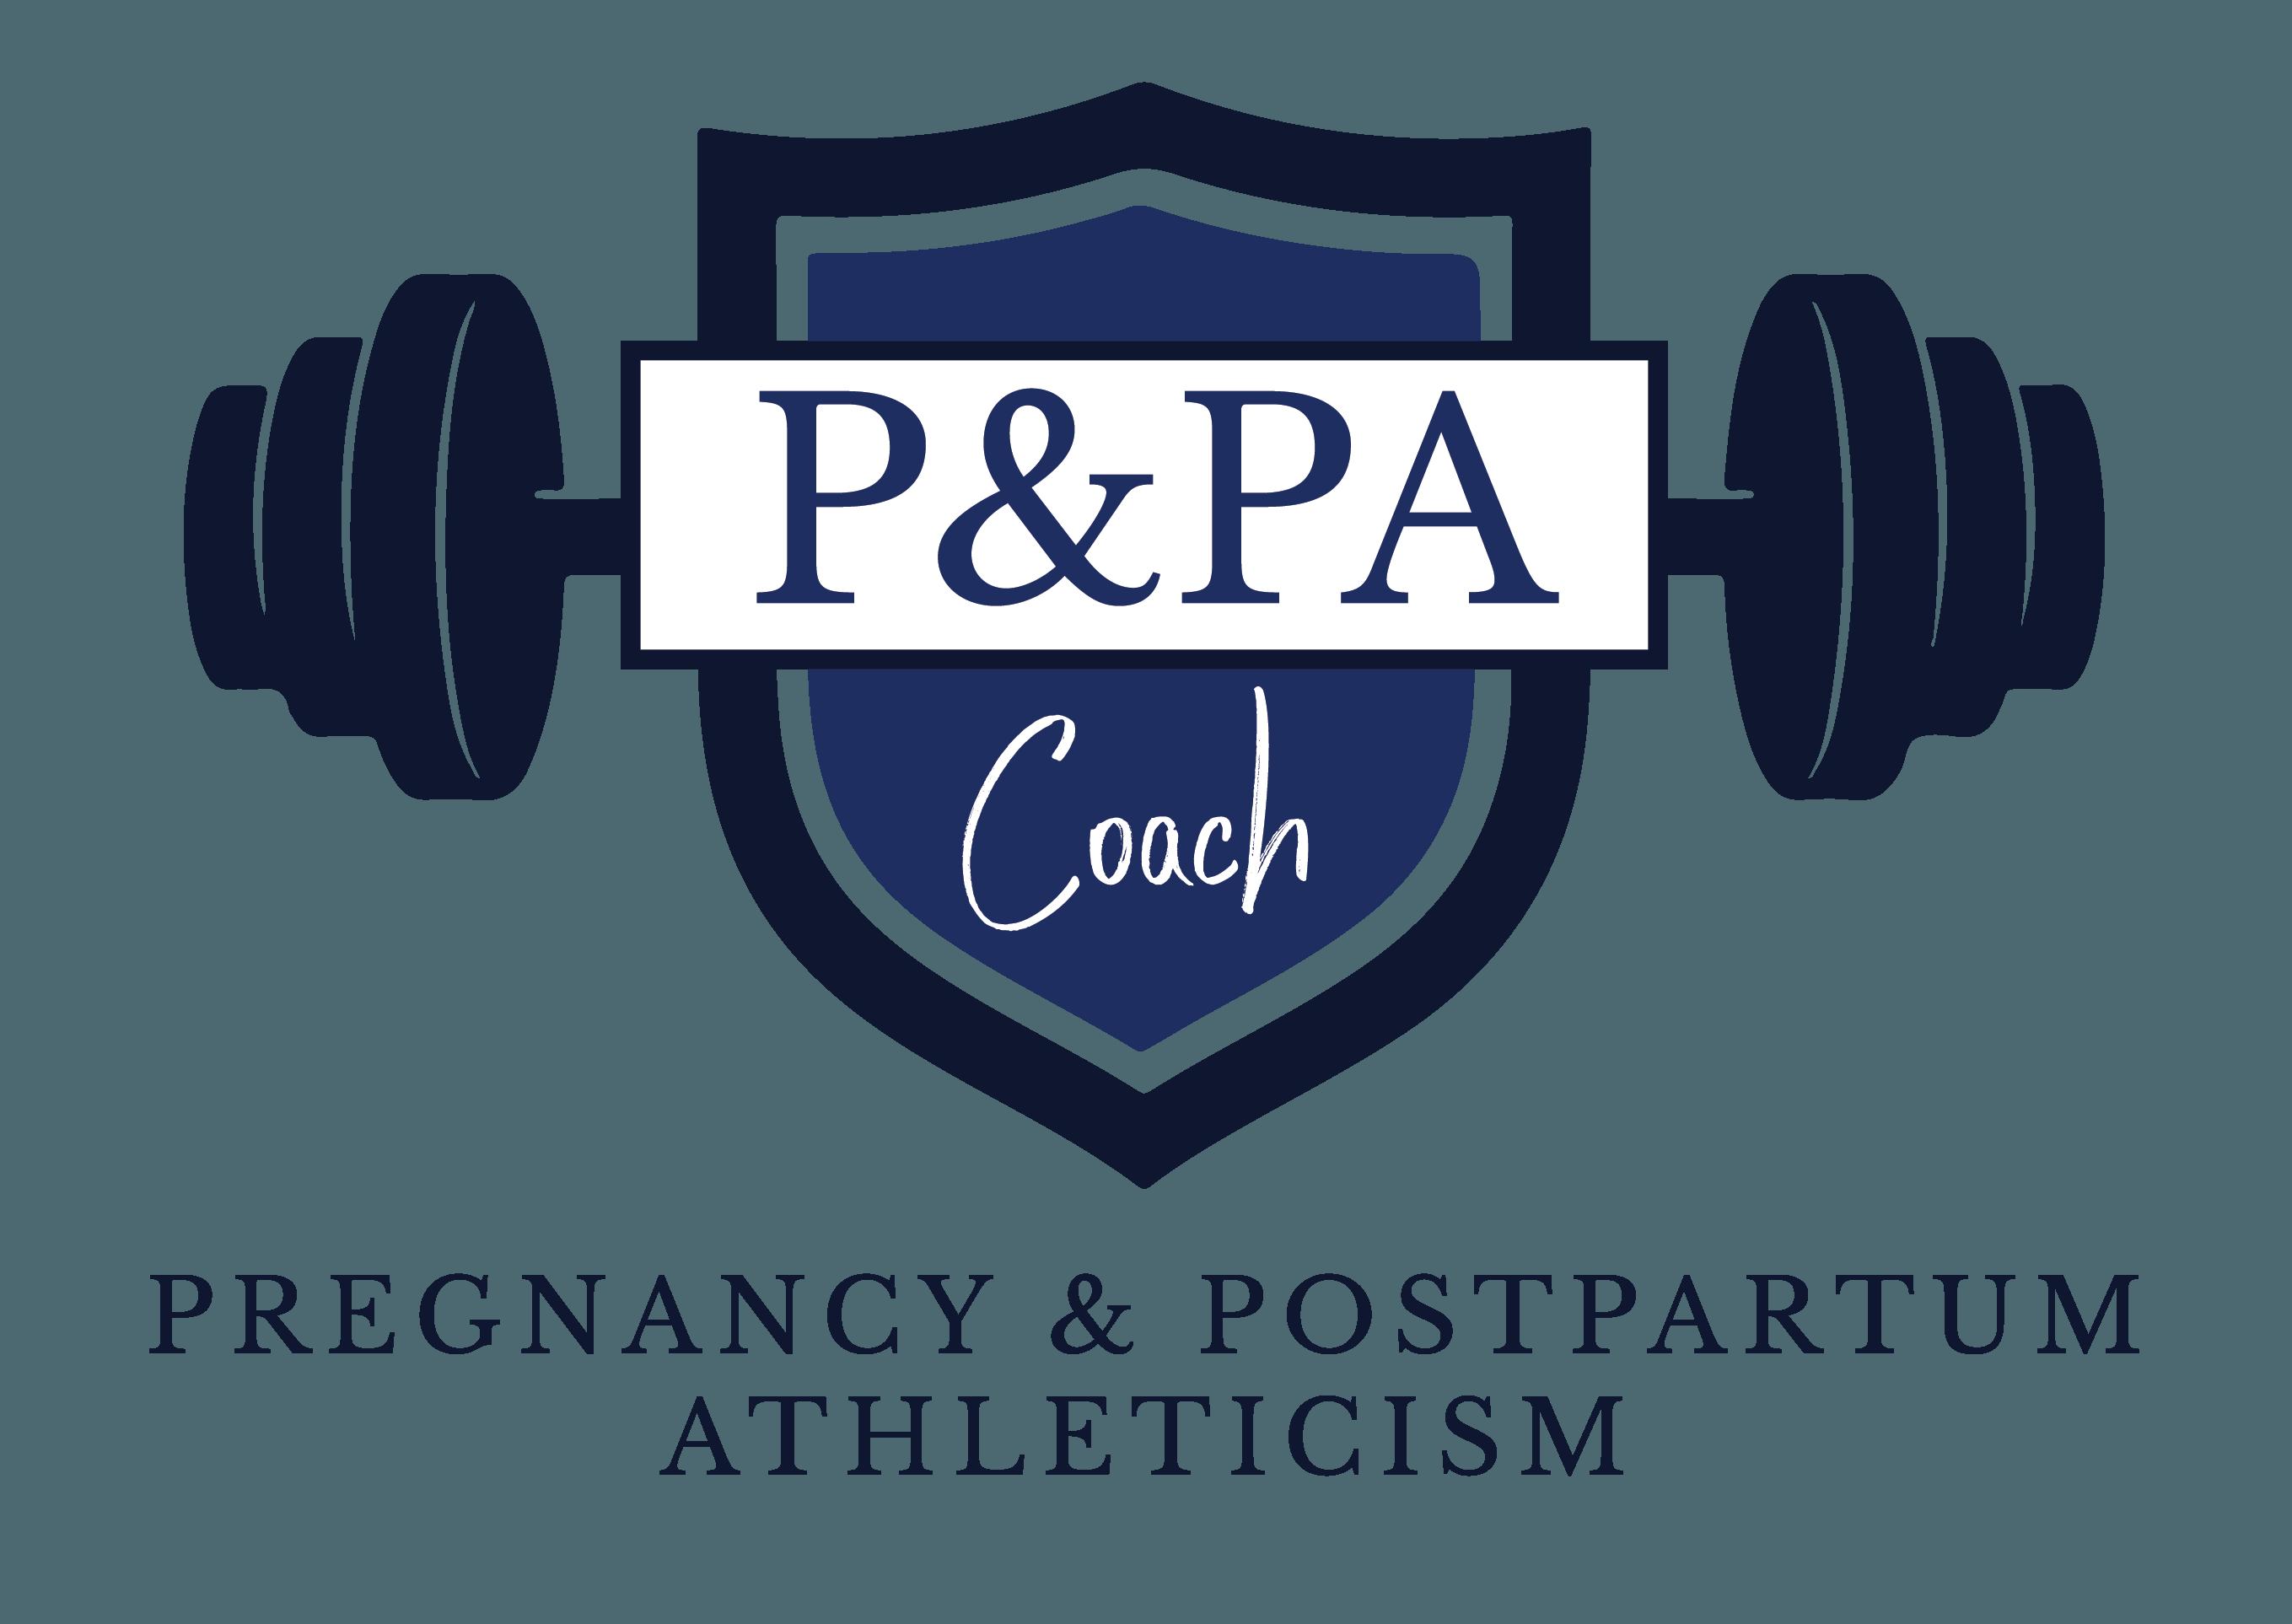 Pregnancy and Postpartum Athleticism Coach Badge